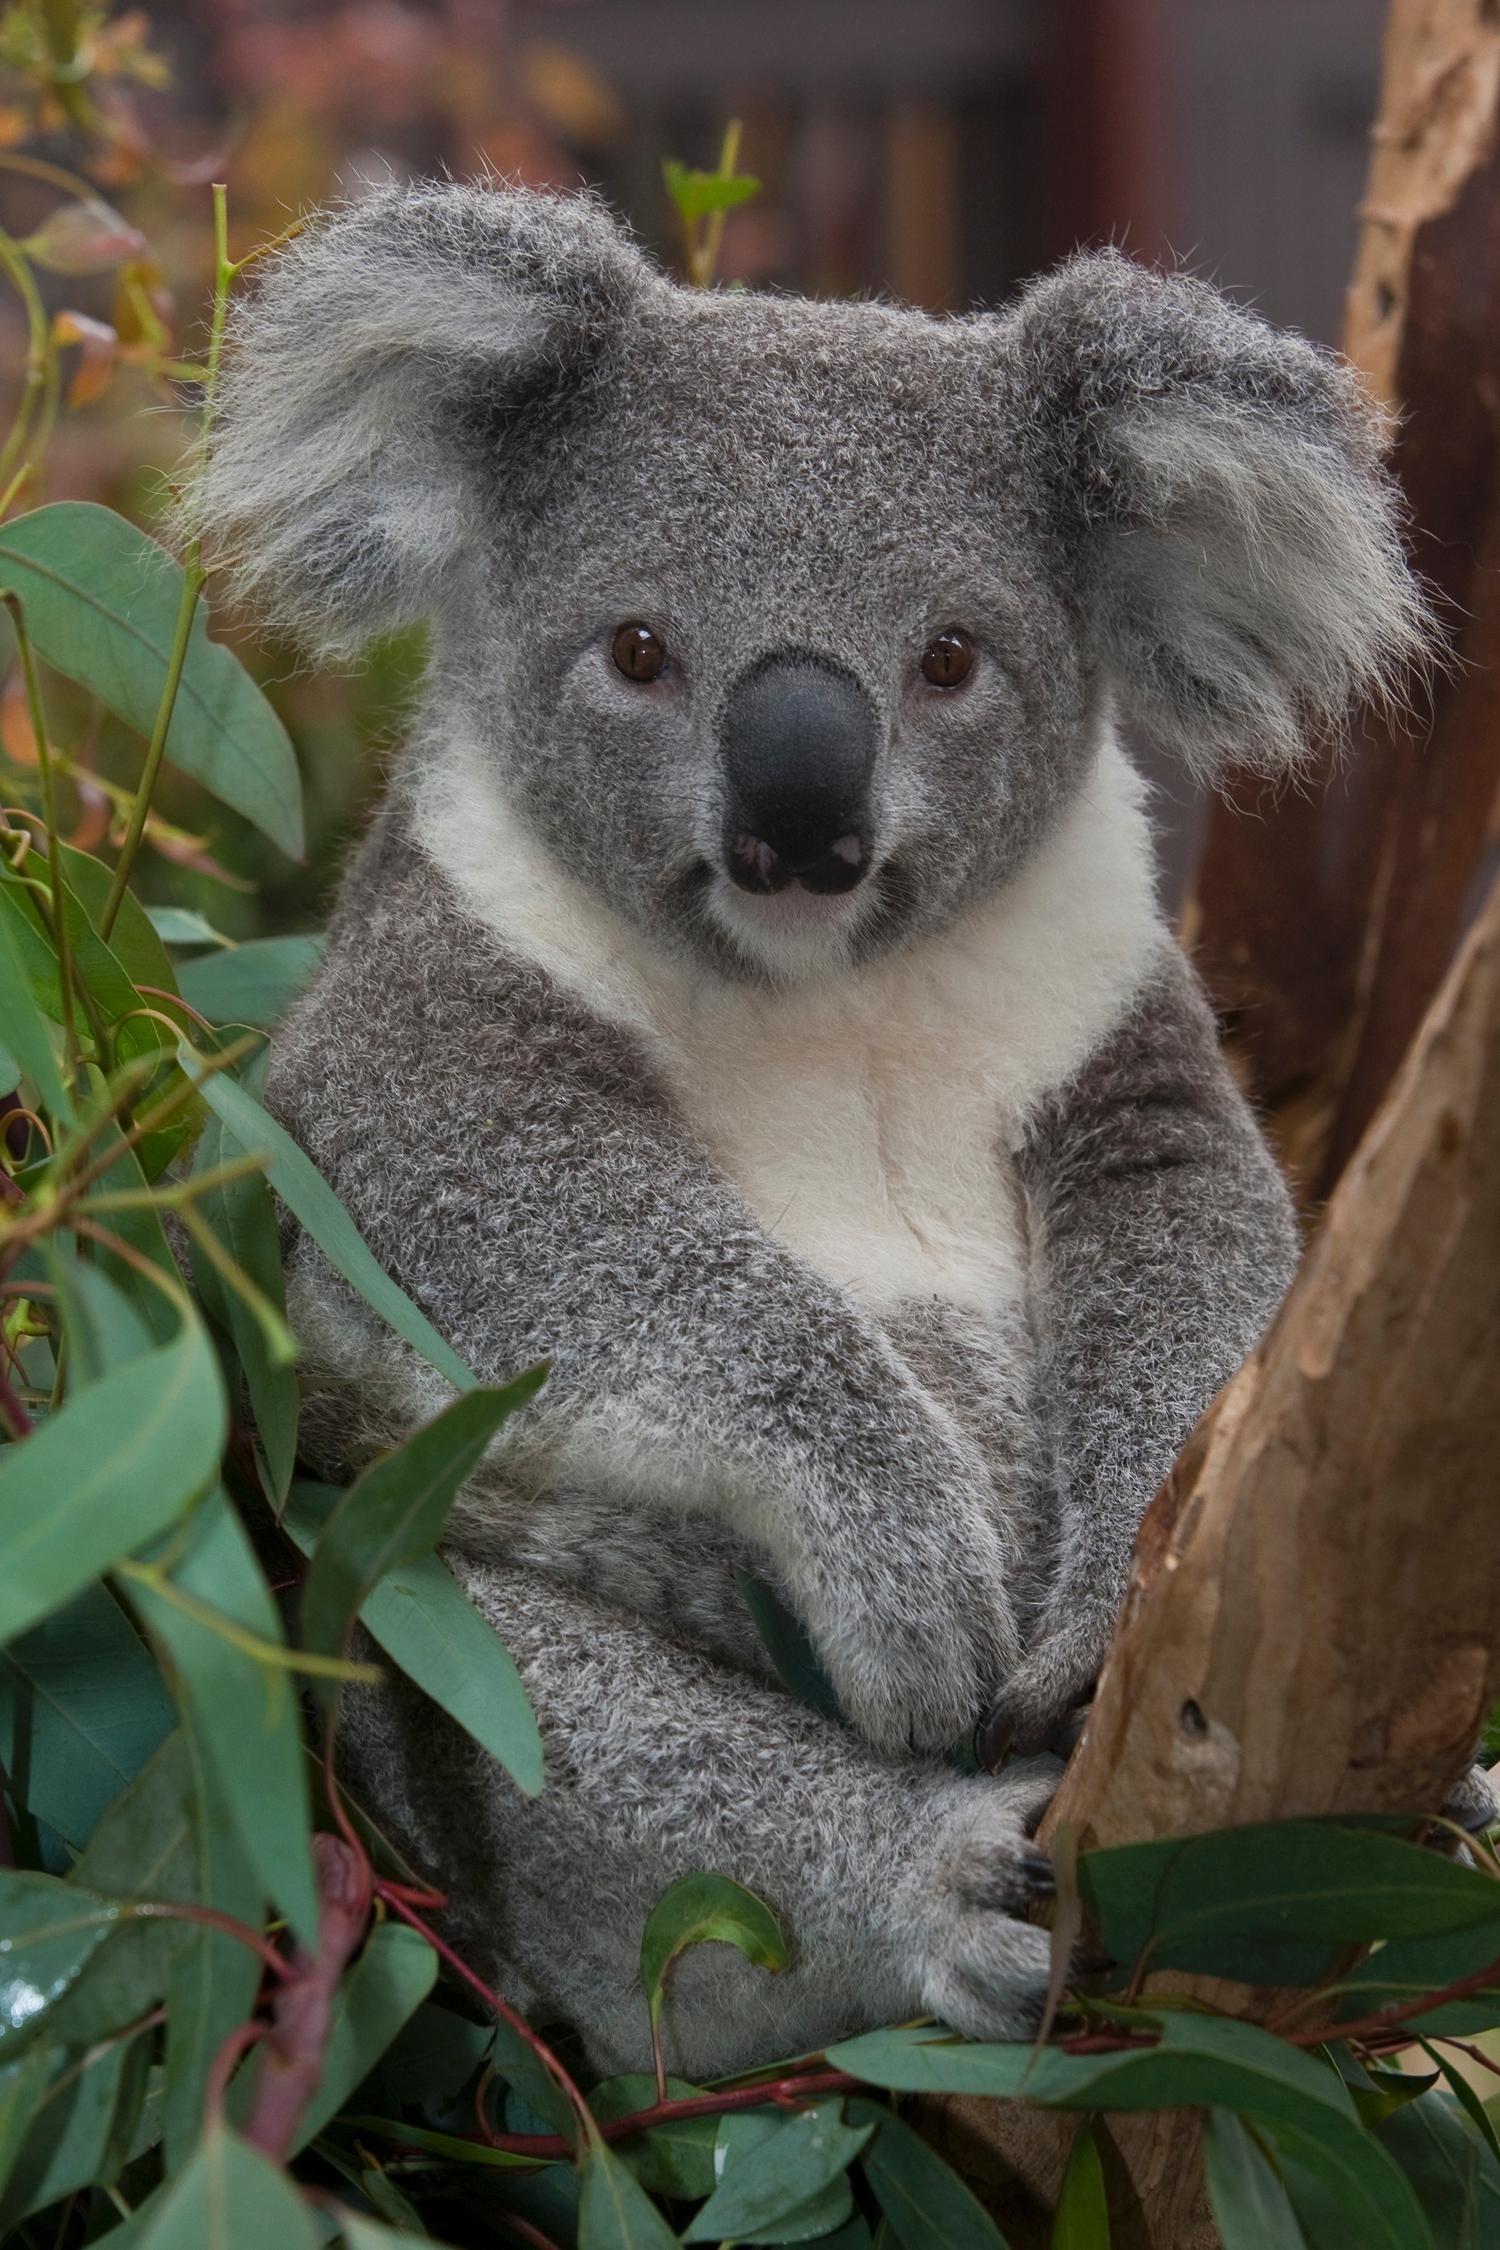 Baby Koala Wallpaper (57+ images)